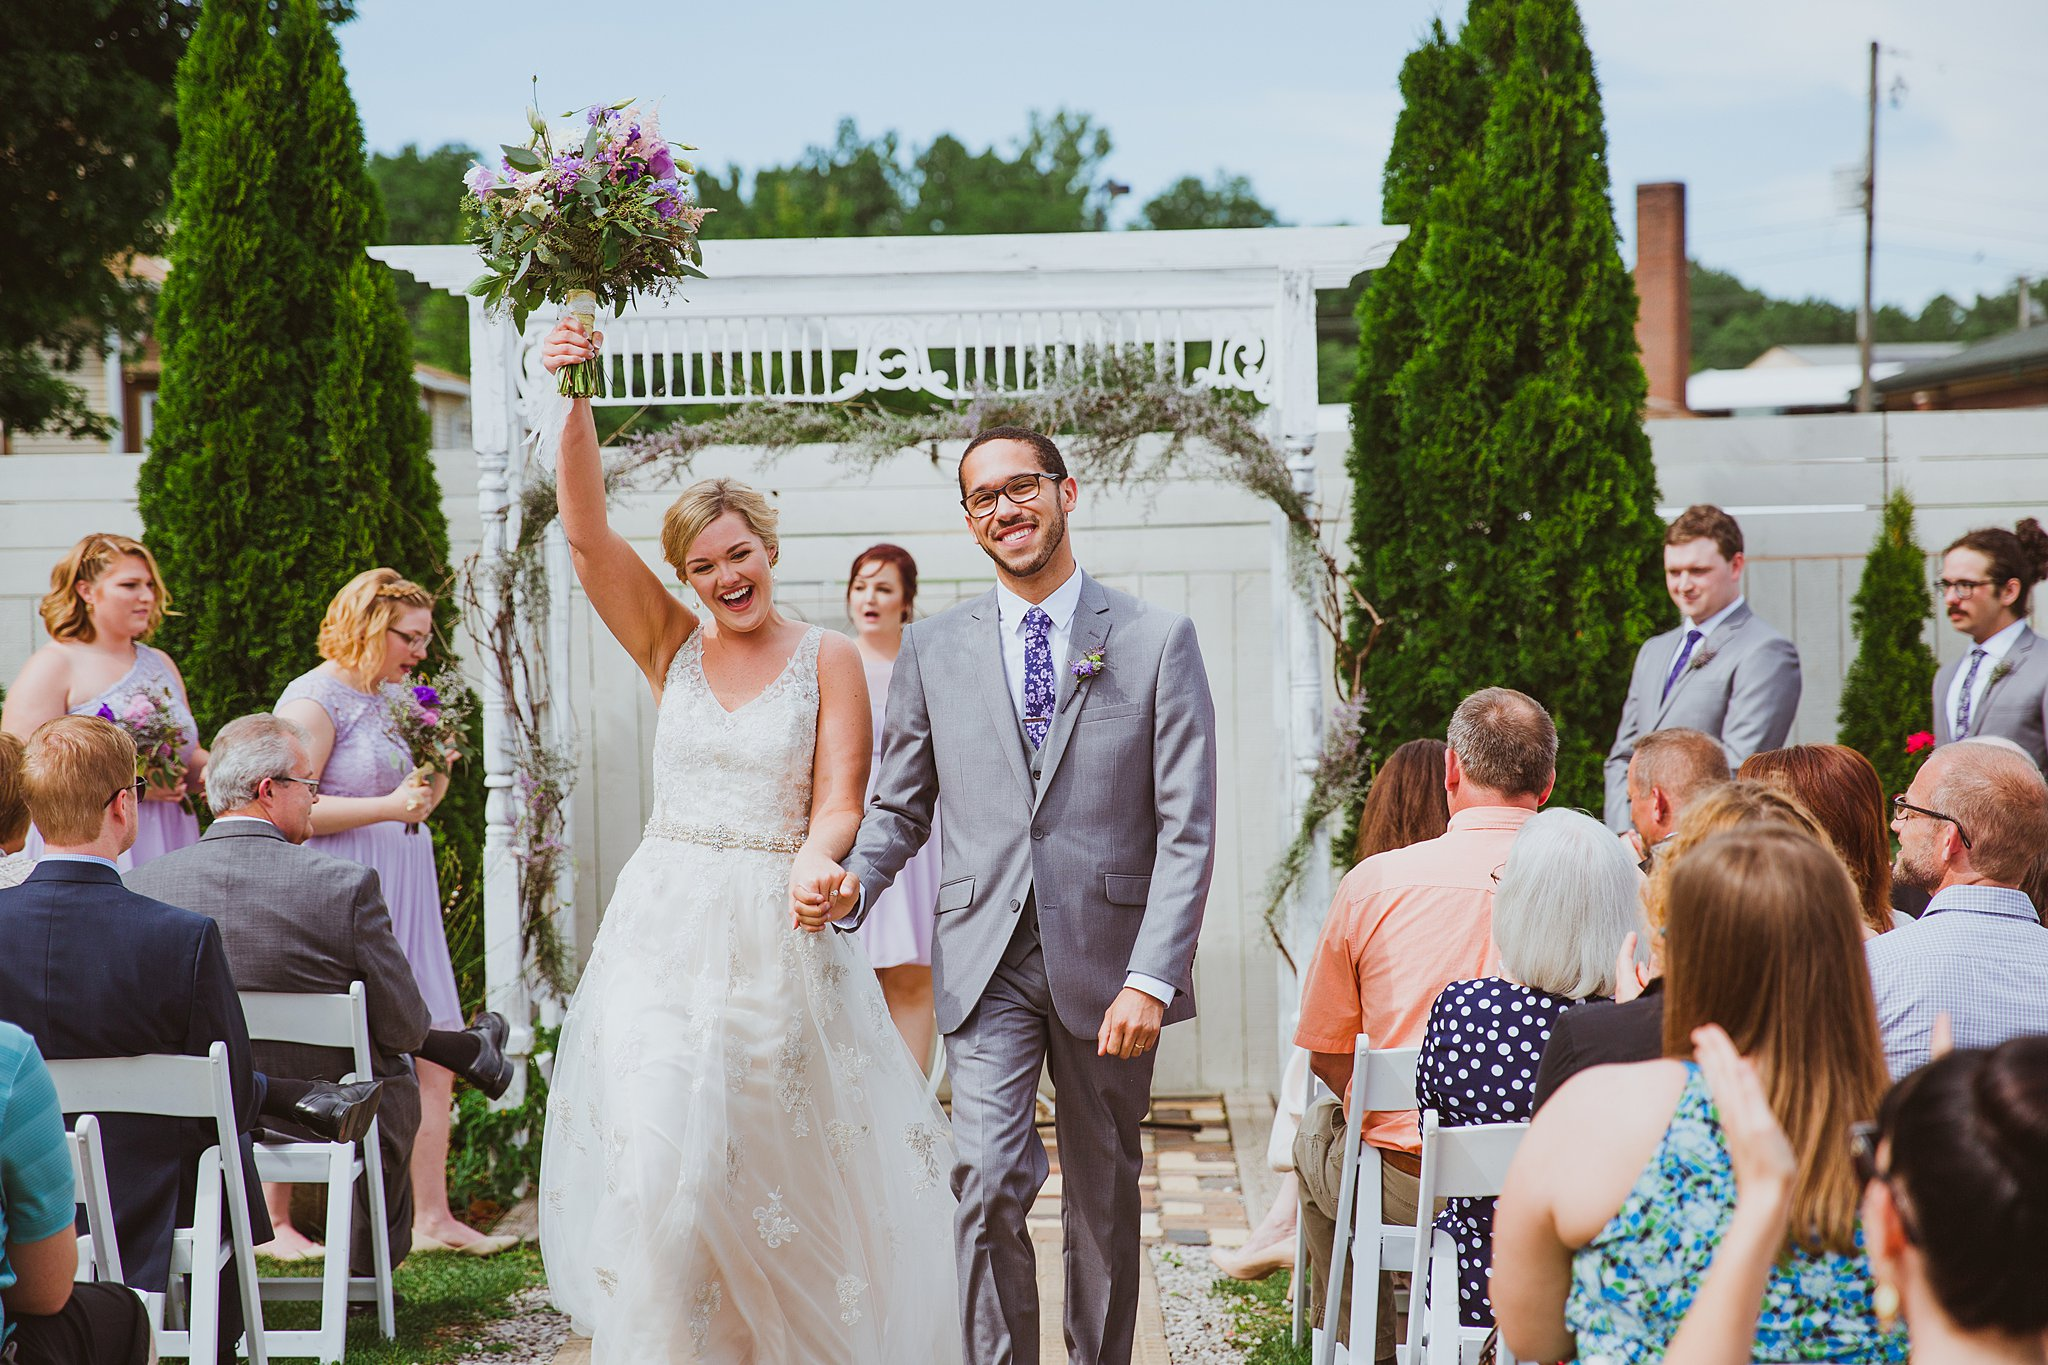 wedding bride and groom recessional fist pump